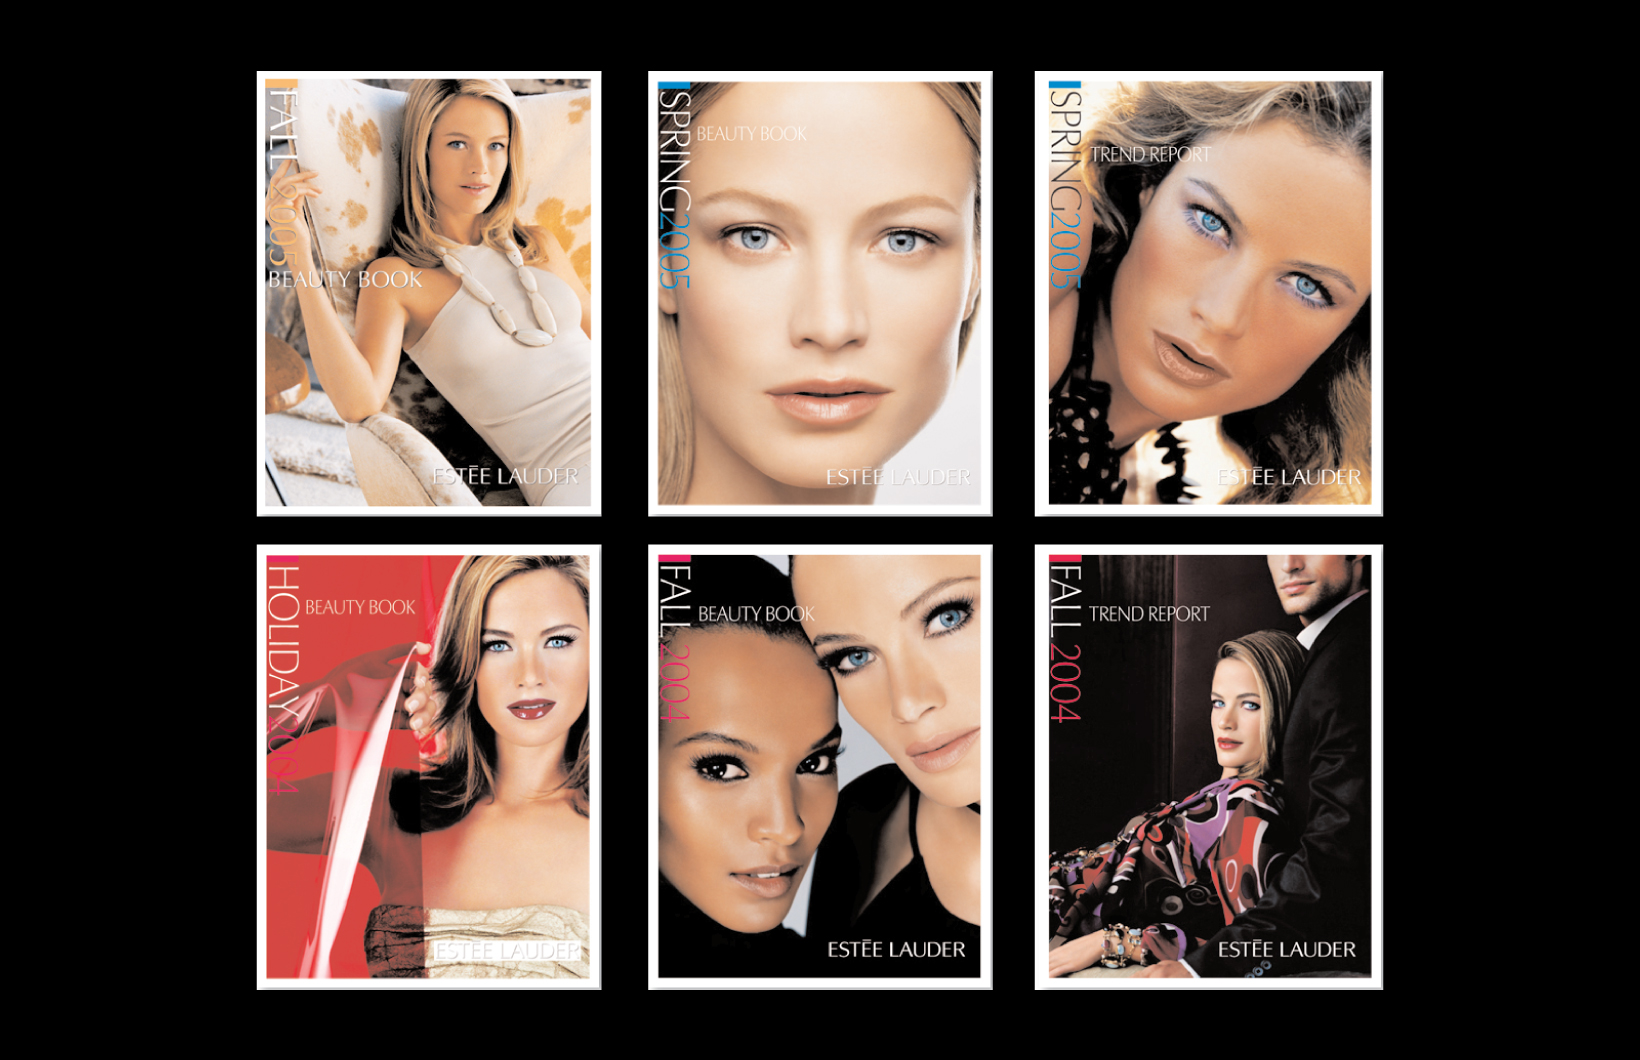 02-Beauty-Books